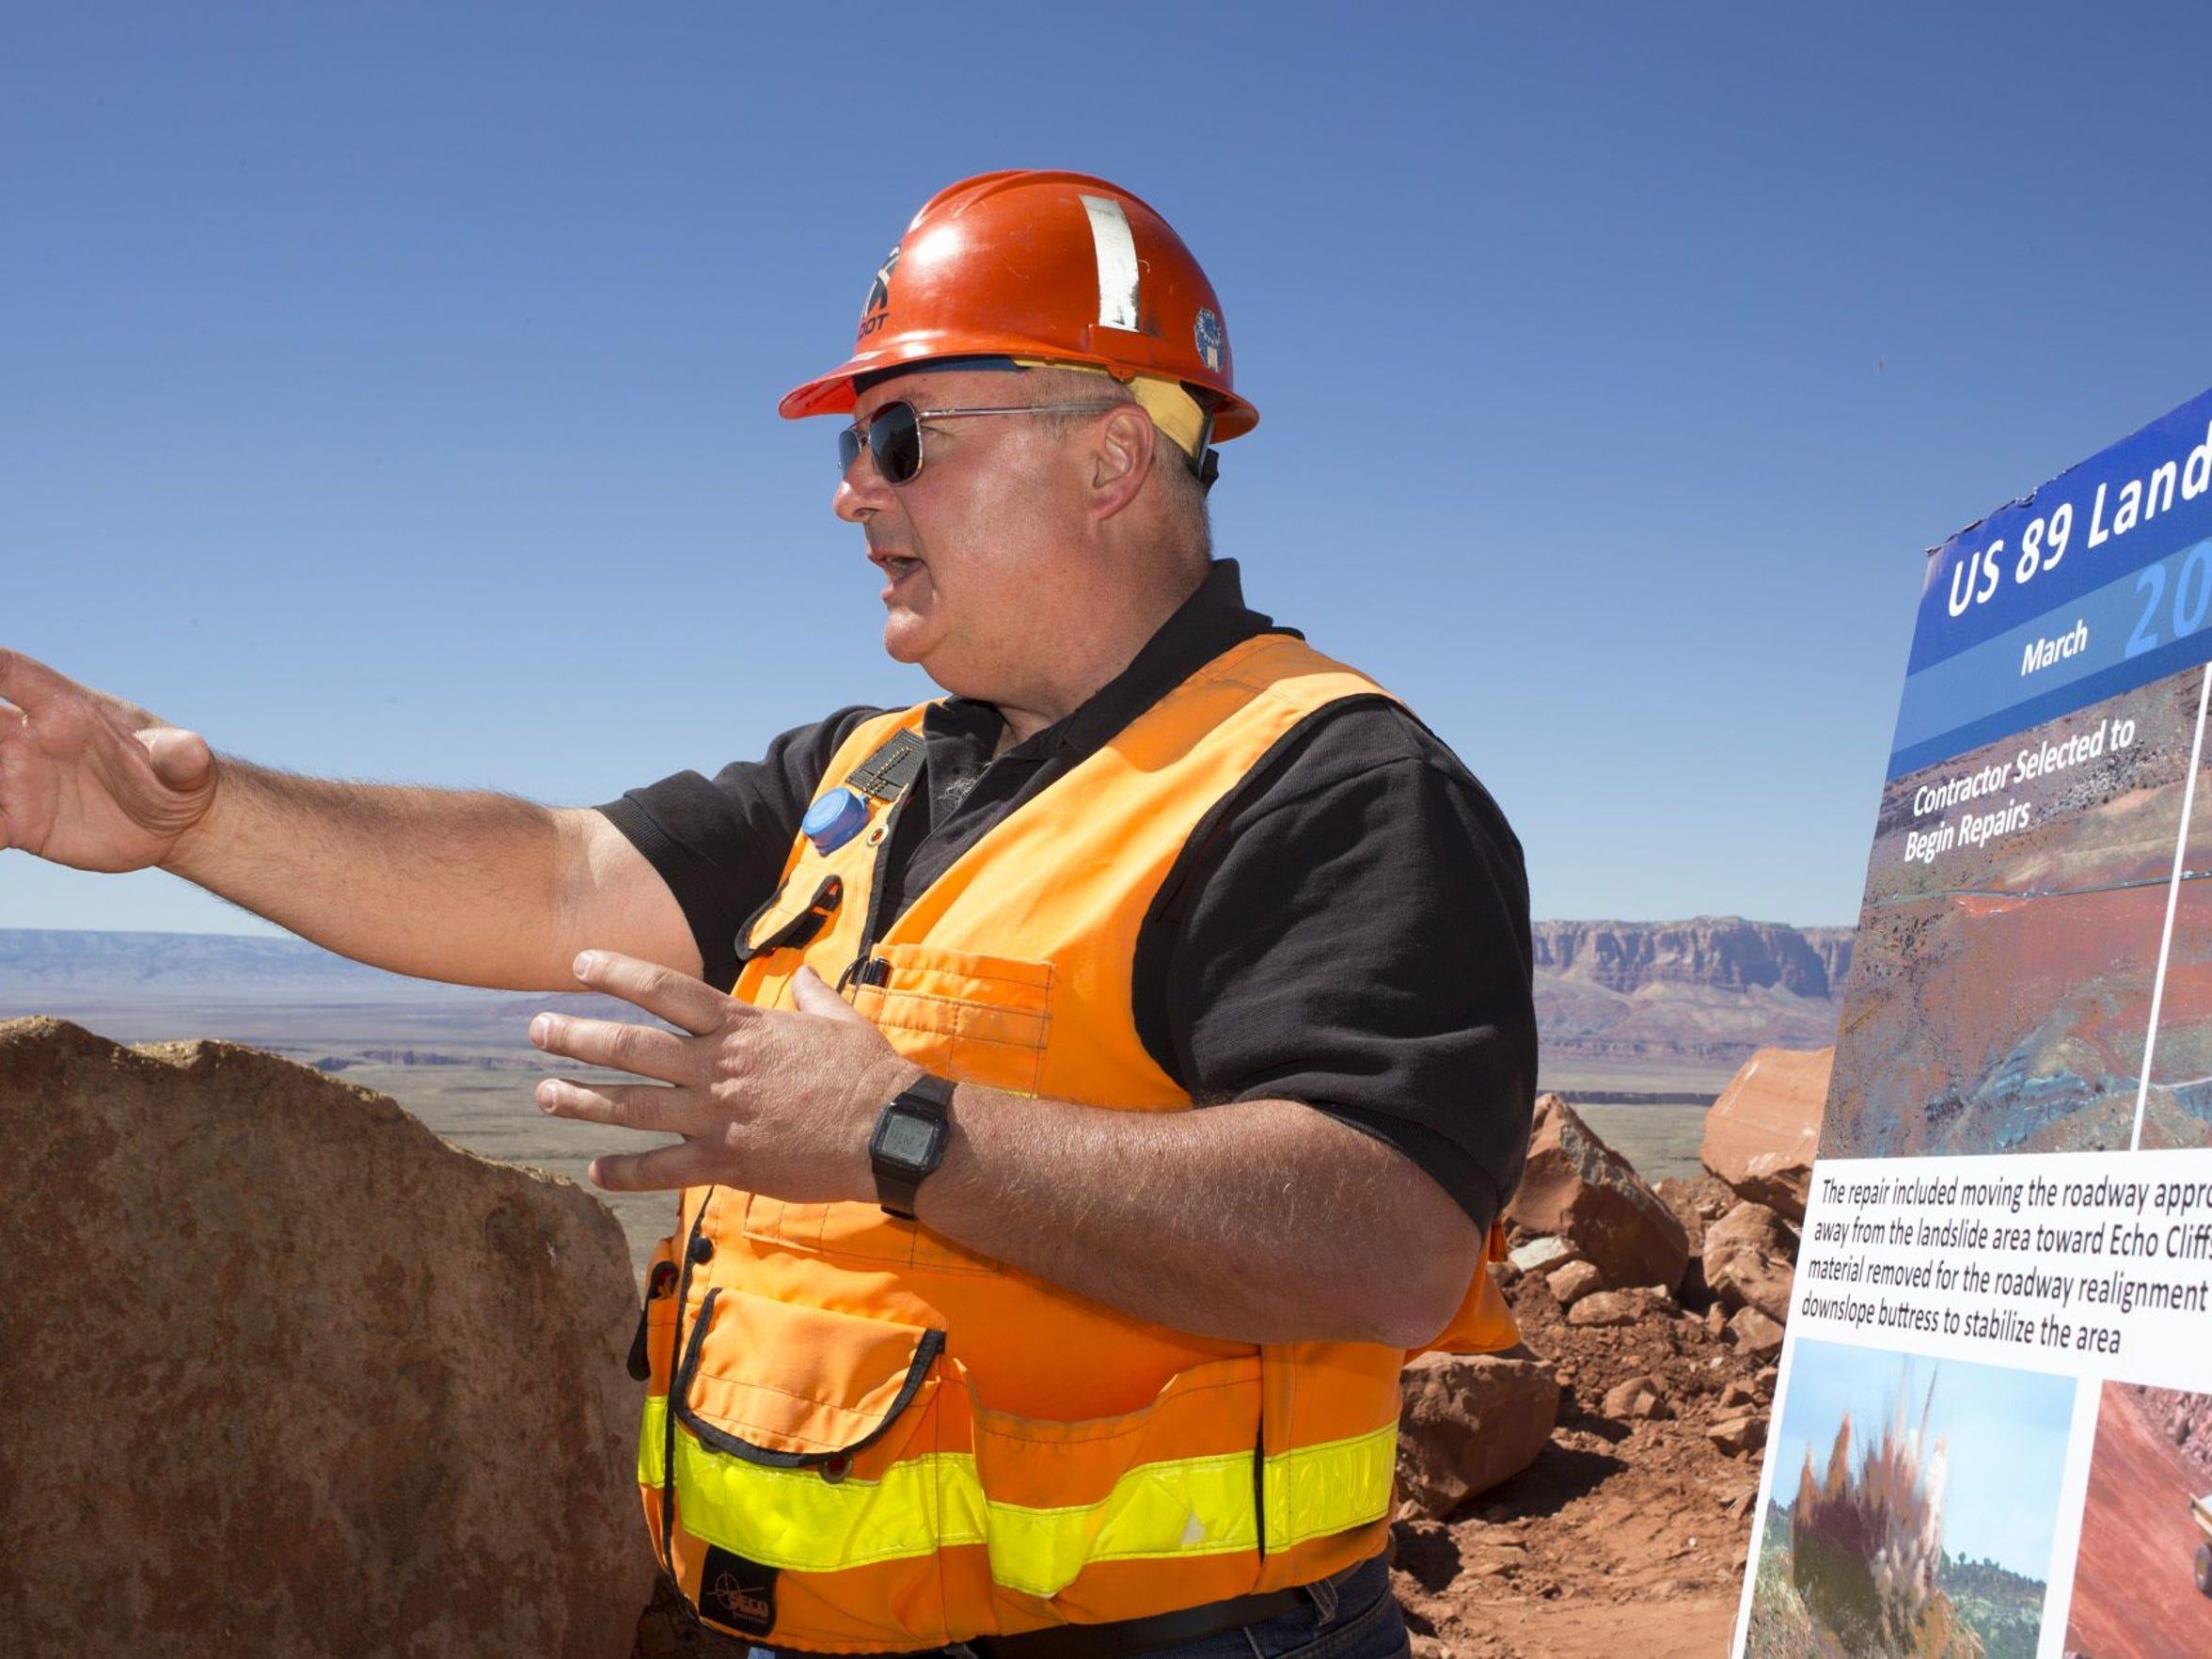 ADOT construction engineer Steve Monroe talks about